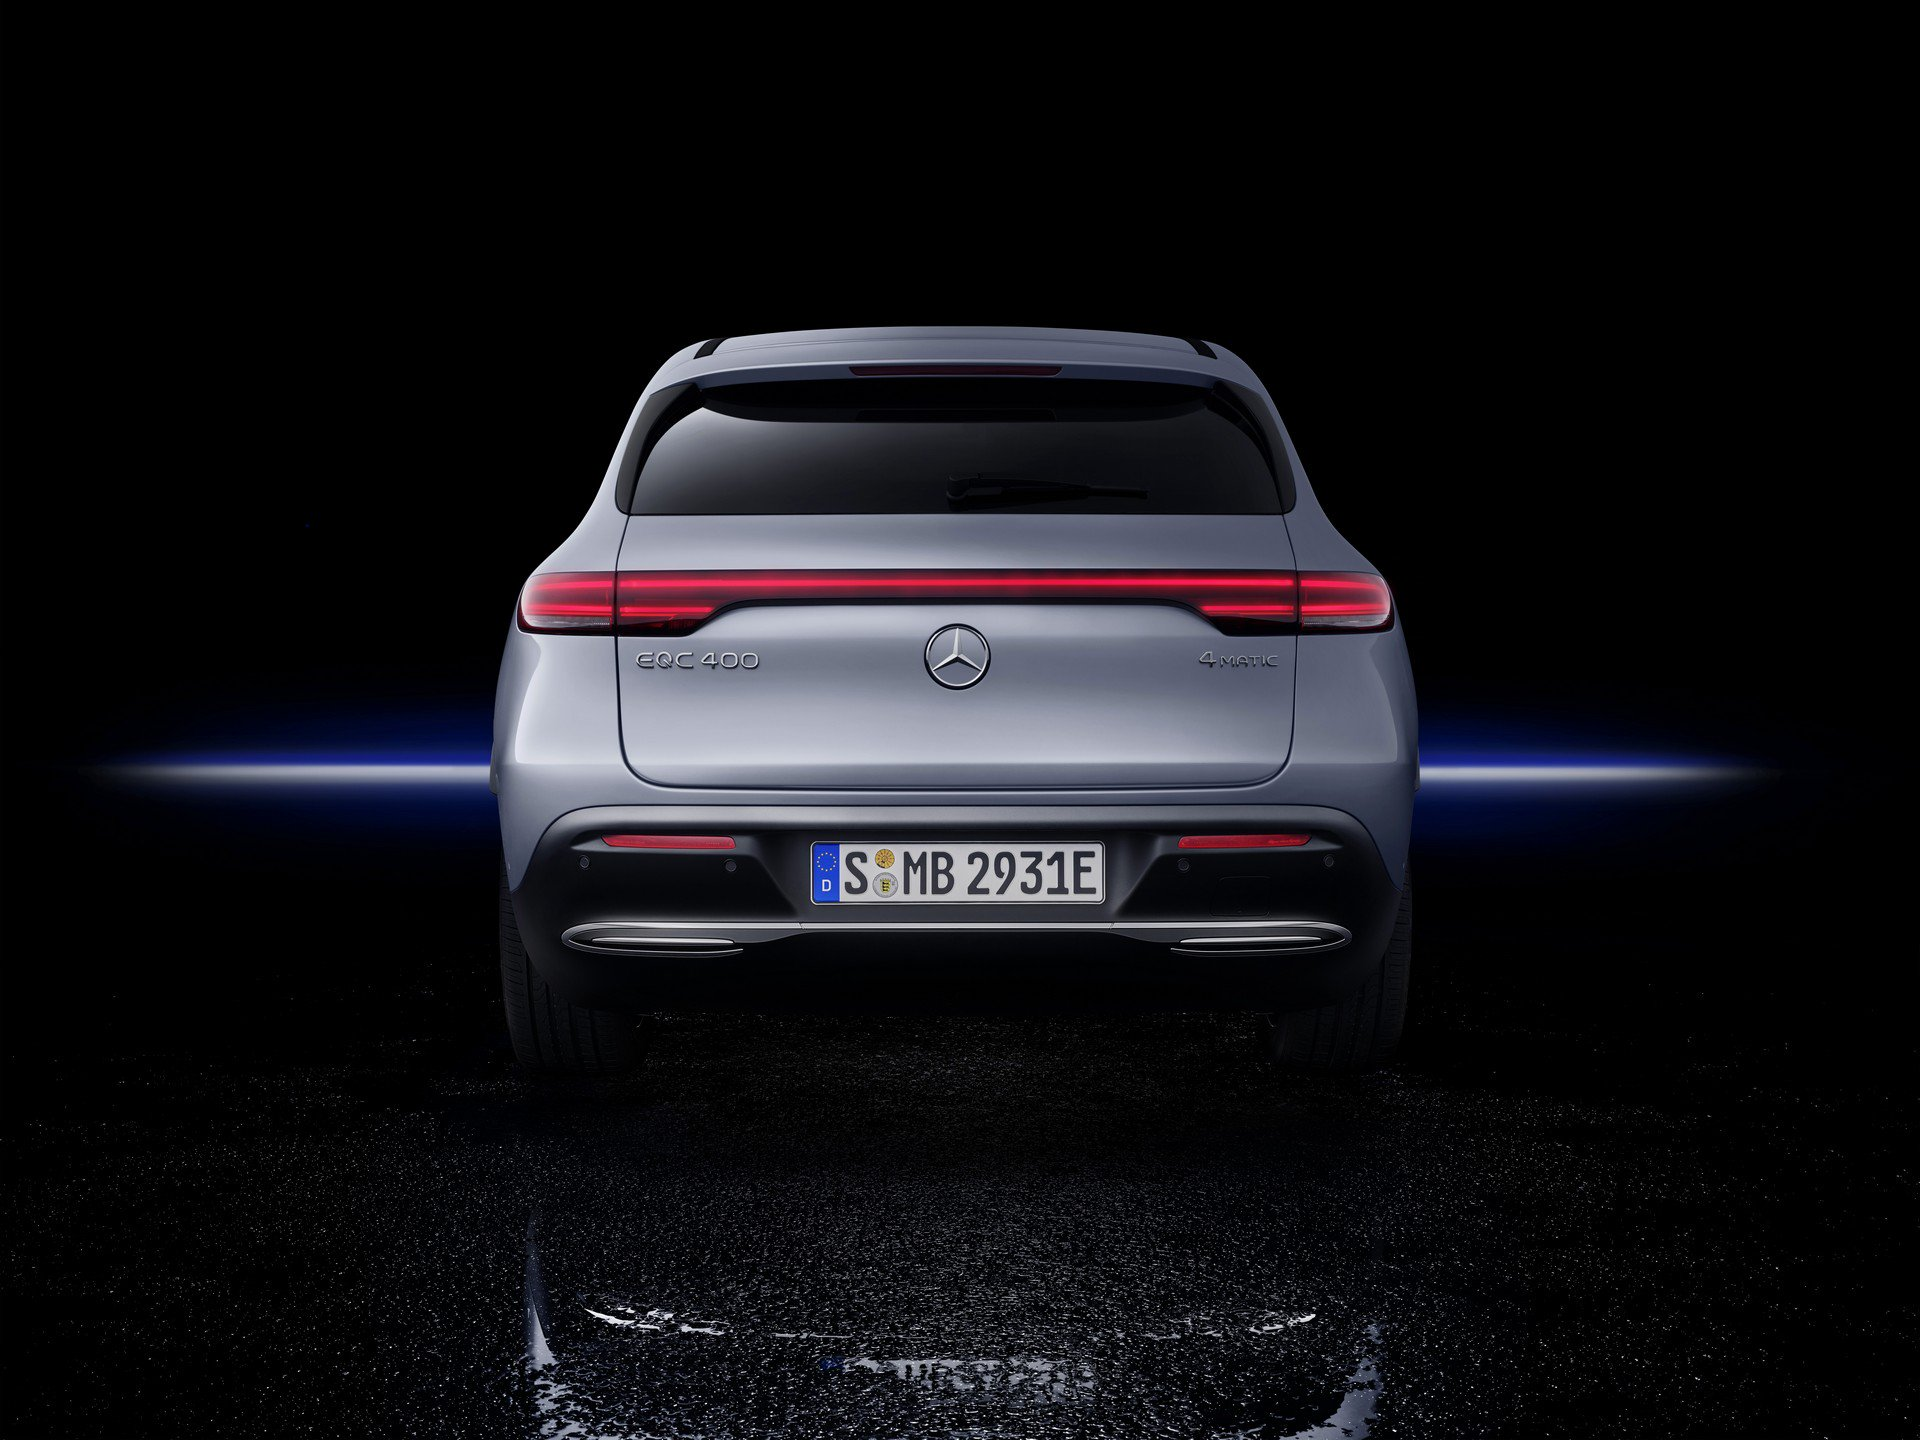 2020 Mercedes Benz Eqc 400 4matic Goes Official Comes